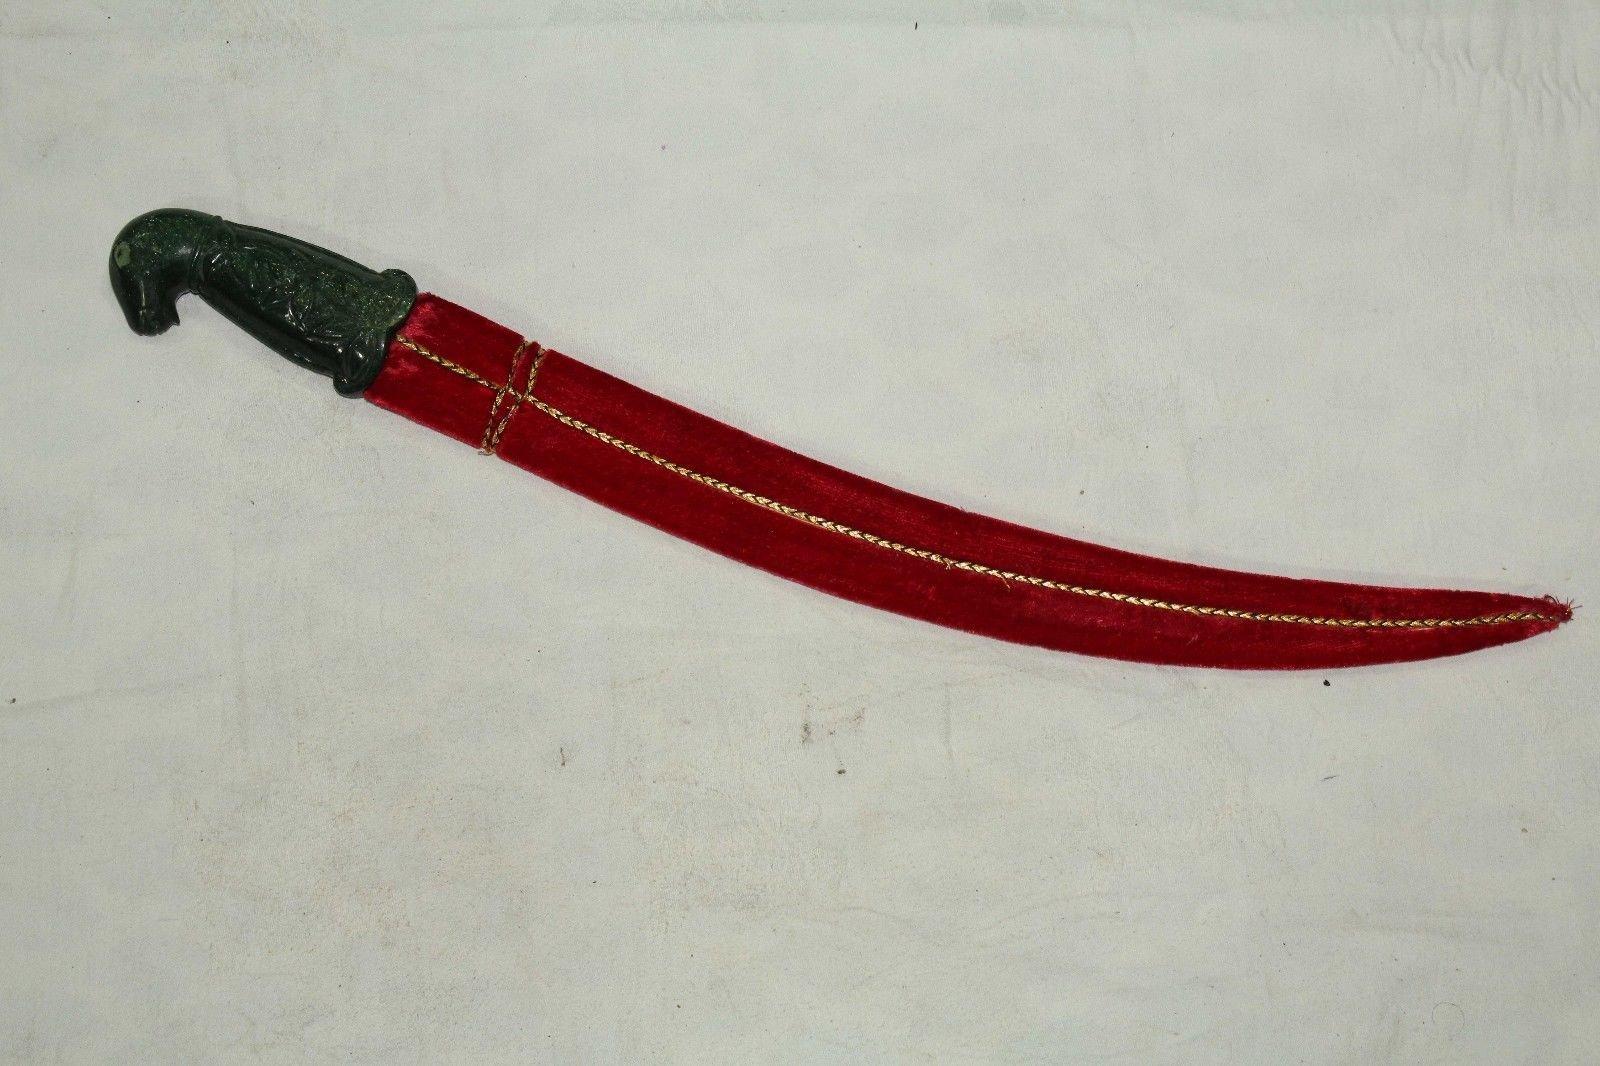 Rajasthan Gems Jade Sheep Face Handle Sword, Damascus steel blade, Silver Wire Work, 23.5 Inch